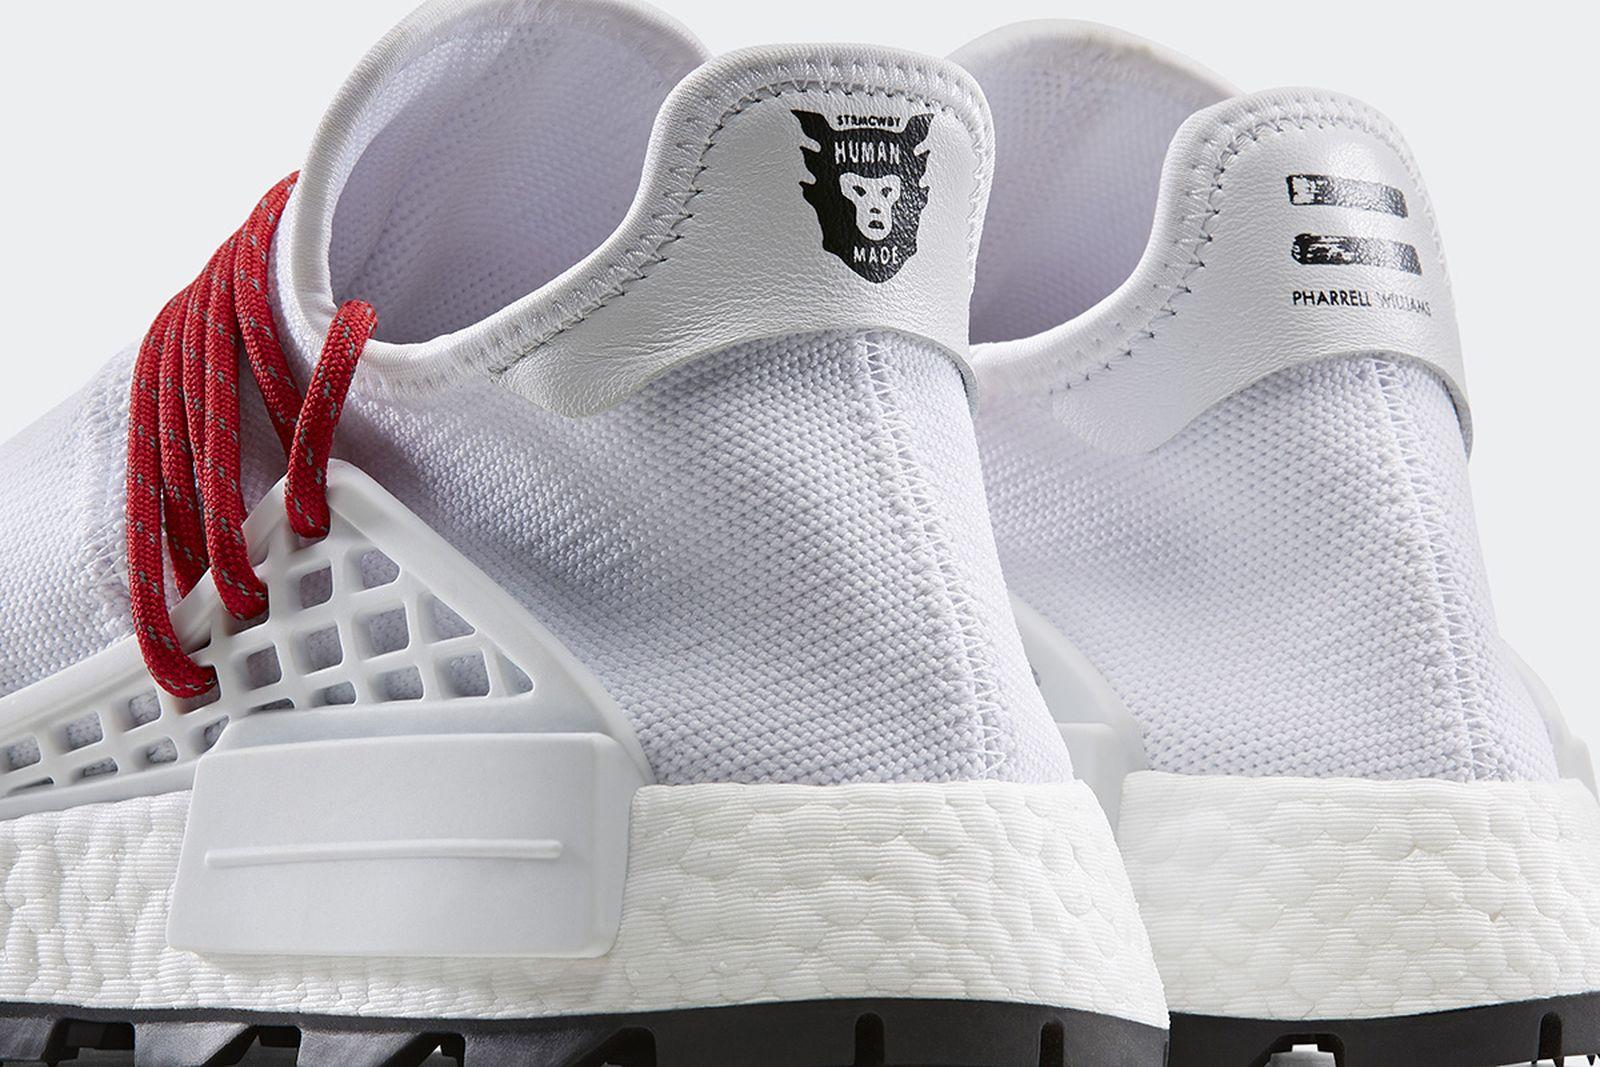 pharrell nigo adidas originals sneaker collection release date price Pharrell Williams human made human race